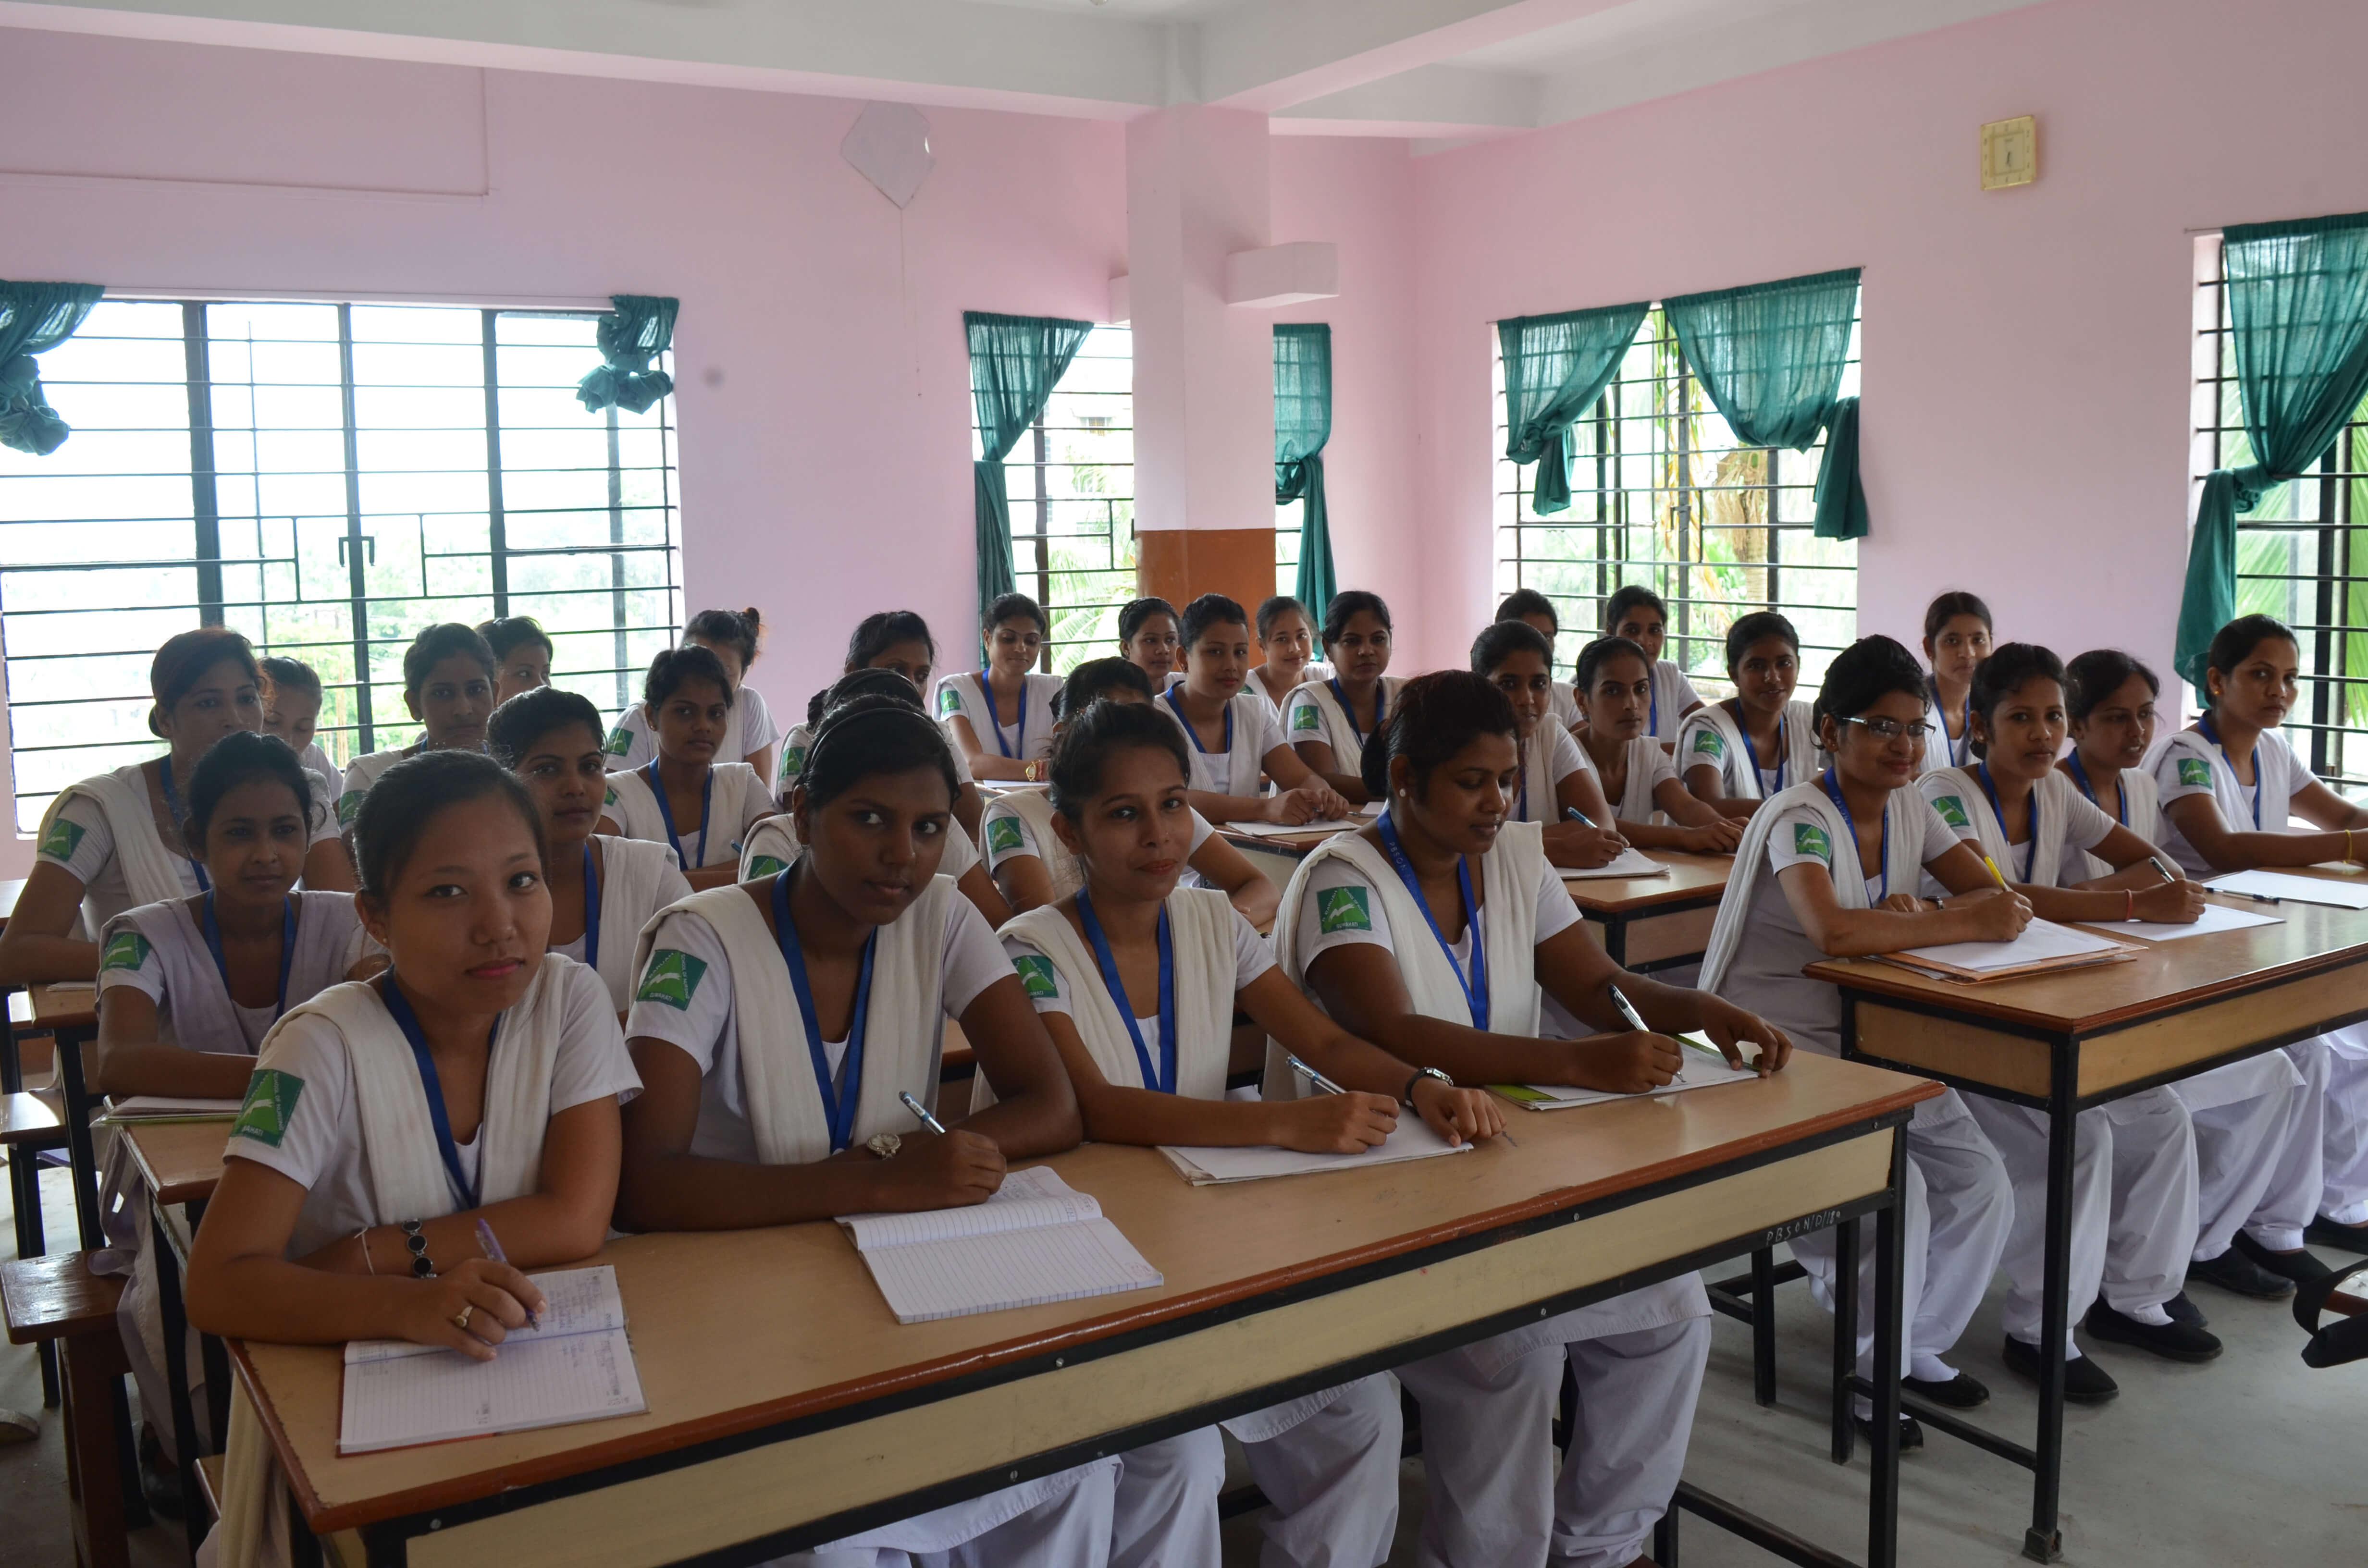 P Baruah School Of Nursing